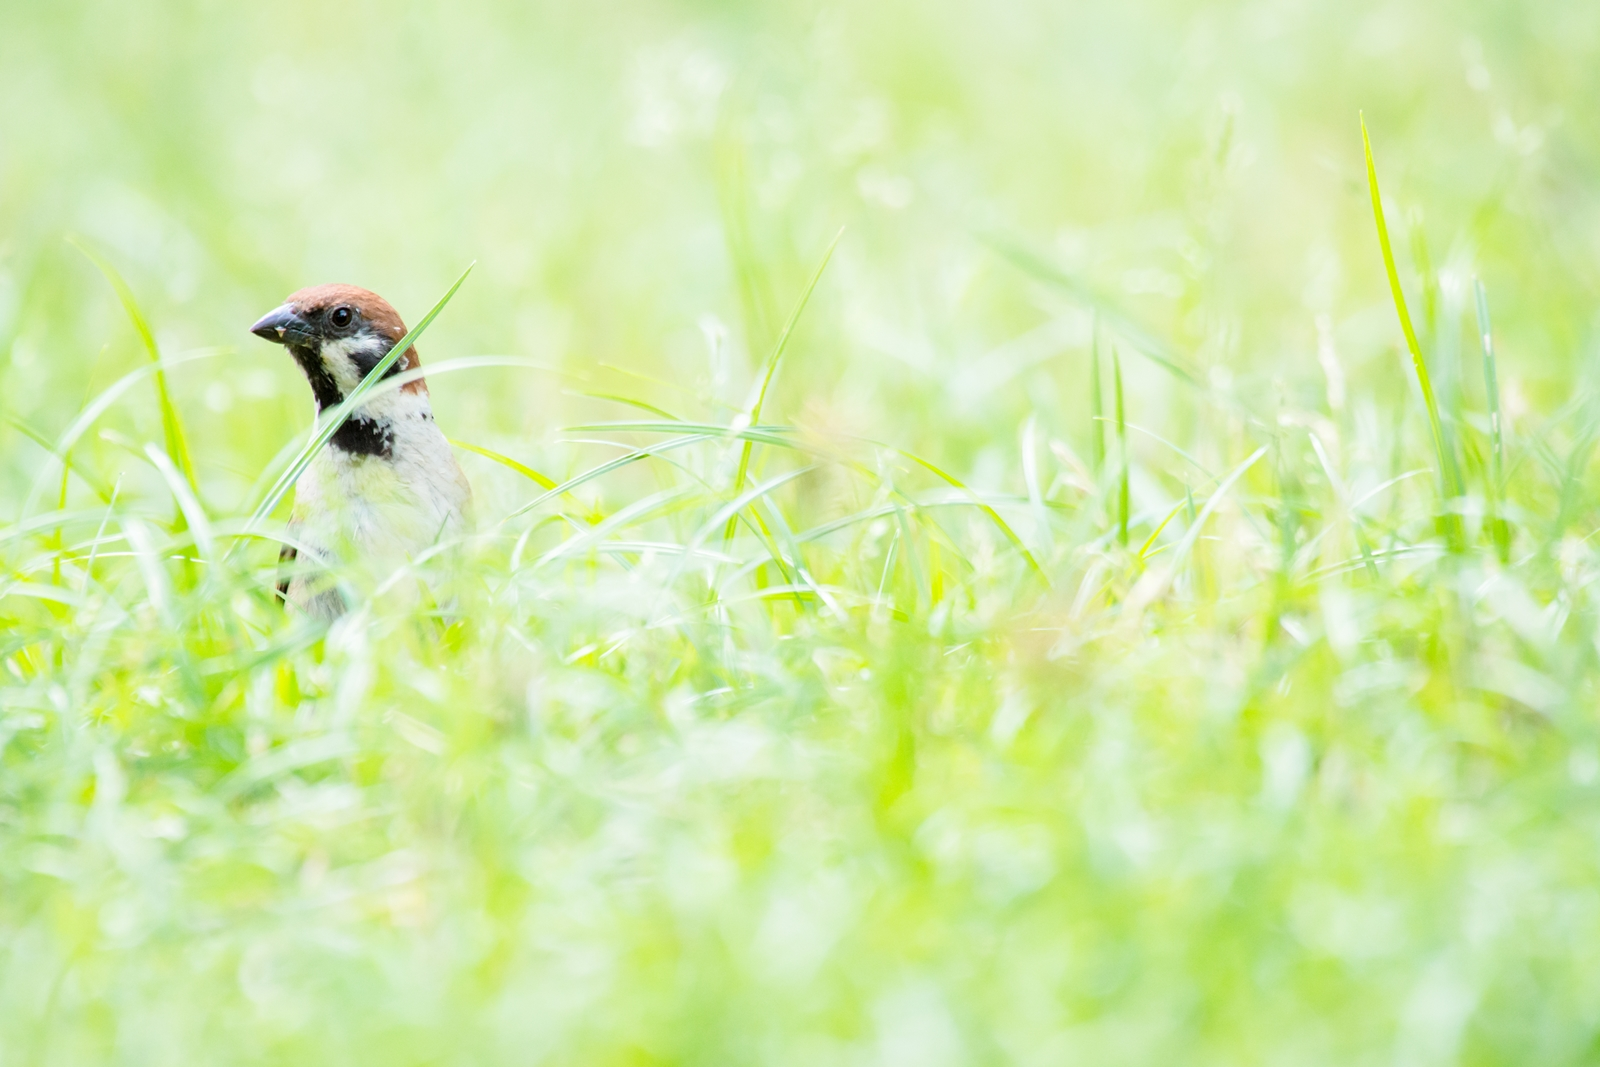 Photo: きょろきょろ Look around restlessly.  周囲を覆う緑の世界 ごはん探しも小さな探検 背を伸ばして キョロキョロキョロキョロ  Sparrow. (雀)  #birdphotography #birds  #cooljapan #kawaii  #nikon #sigma   Nikon D7200 SIGMA APO 50-500mm F5-6.3 DG OS HSM  ・小鳥の詩朗読 /poetry reading https://youtu.be/Ui7OadC7qw8?list=PL2YtHGm0-R3qVsaqvQe9OYdJFCkI98wzF